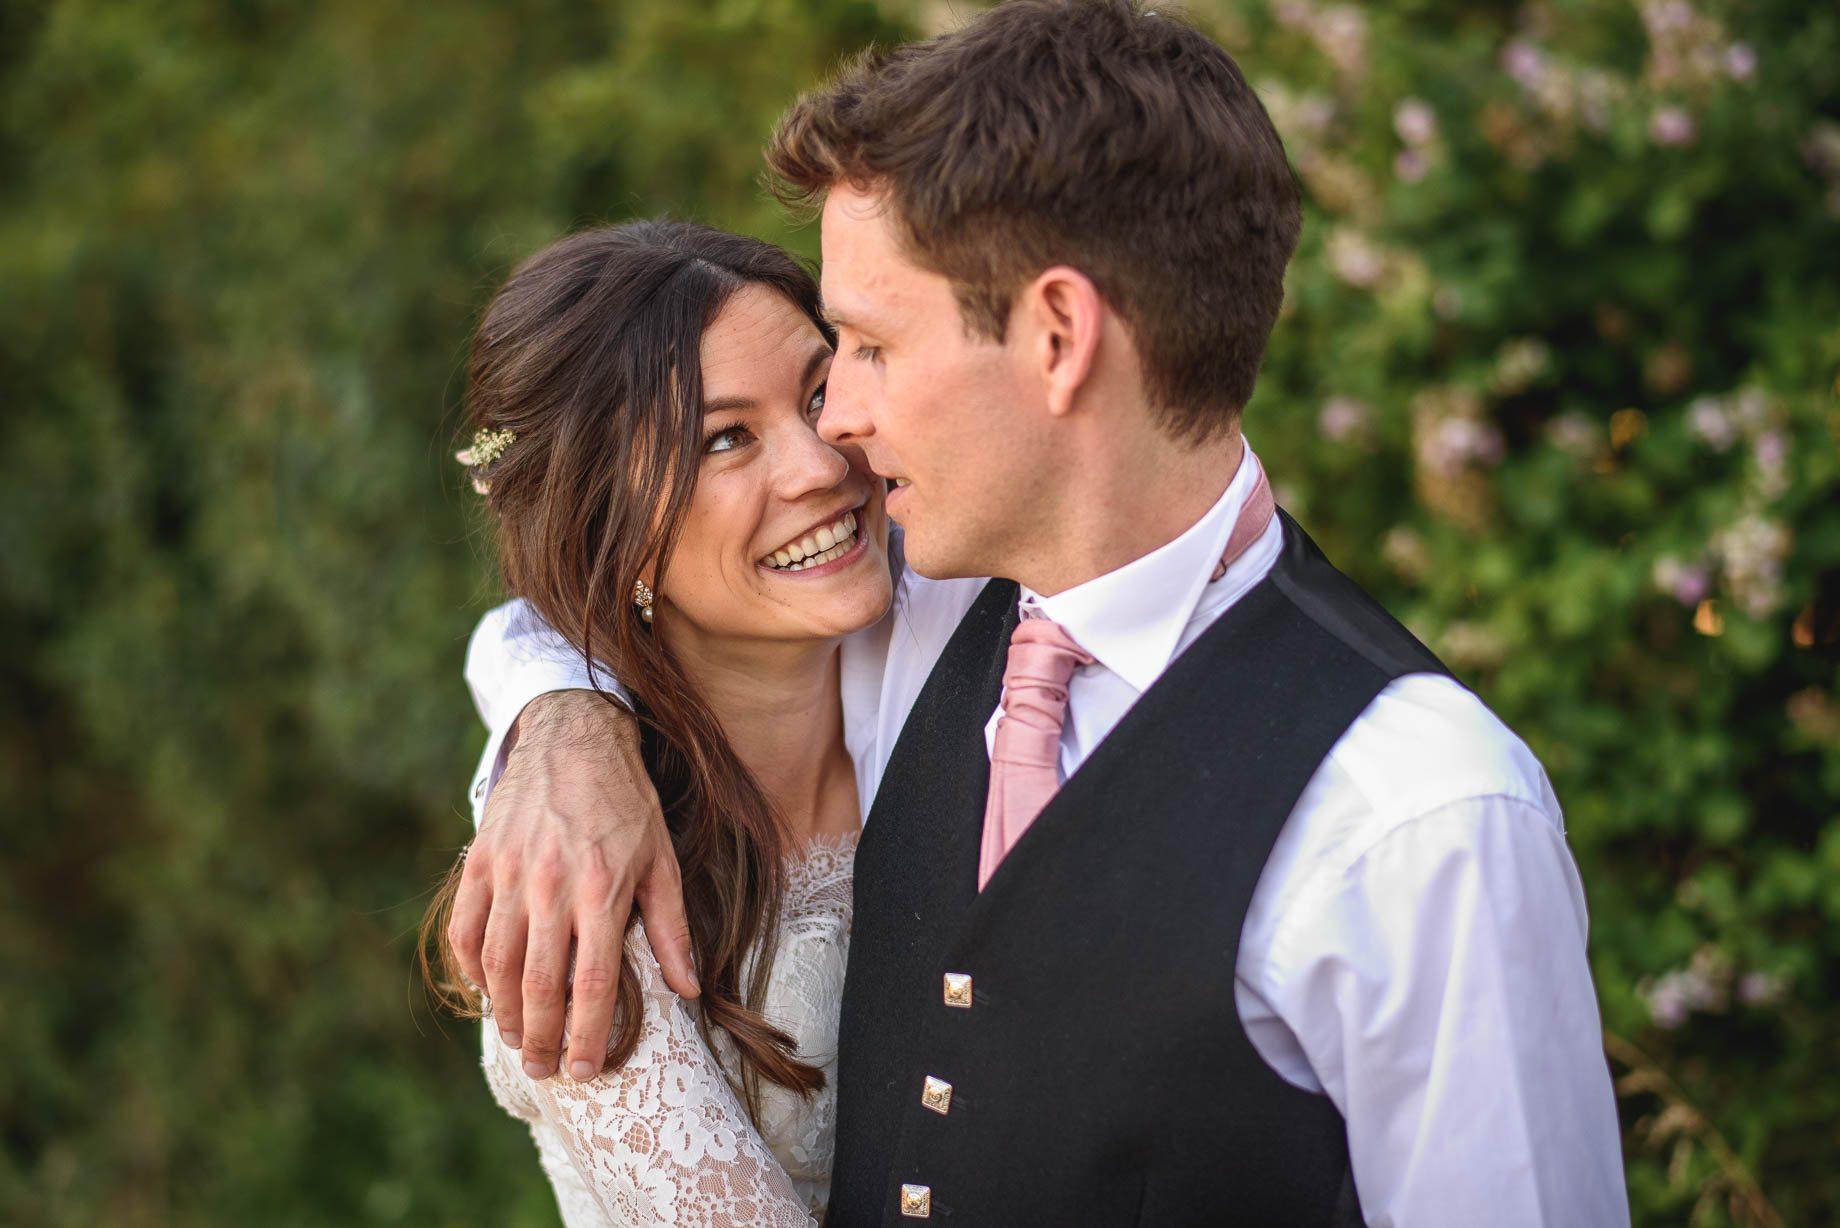 Gildings Barn wedding photography - Sarah and Steve (156 of 190)